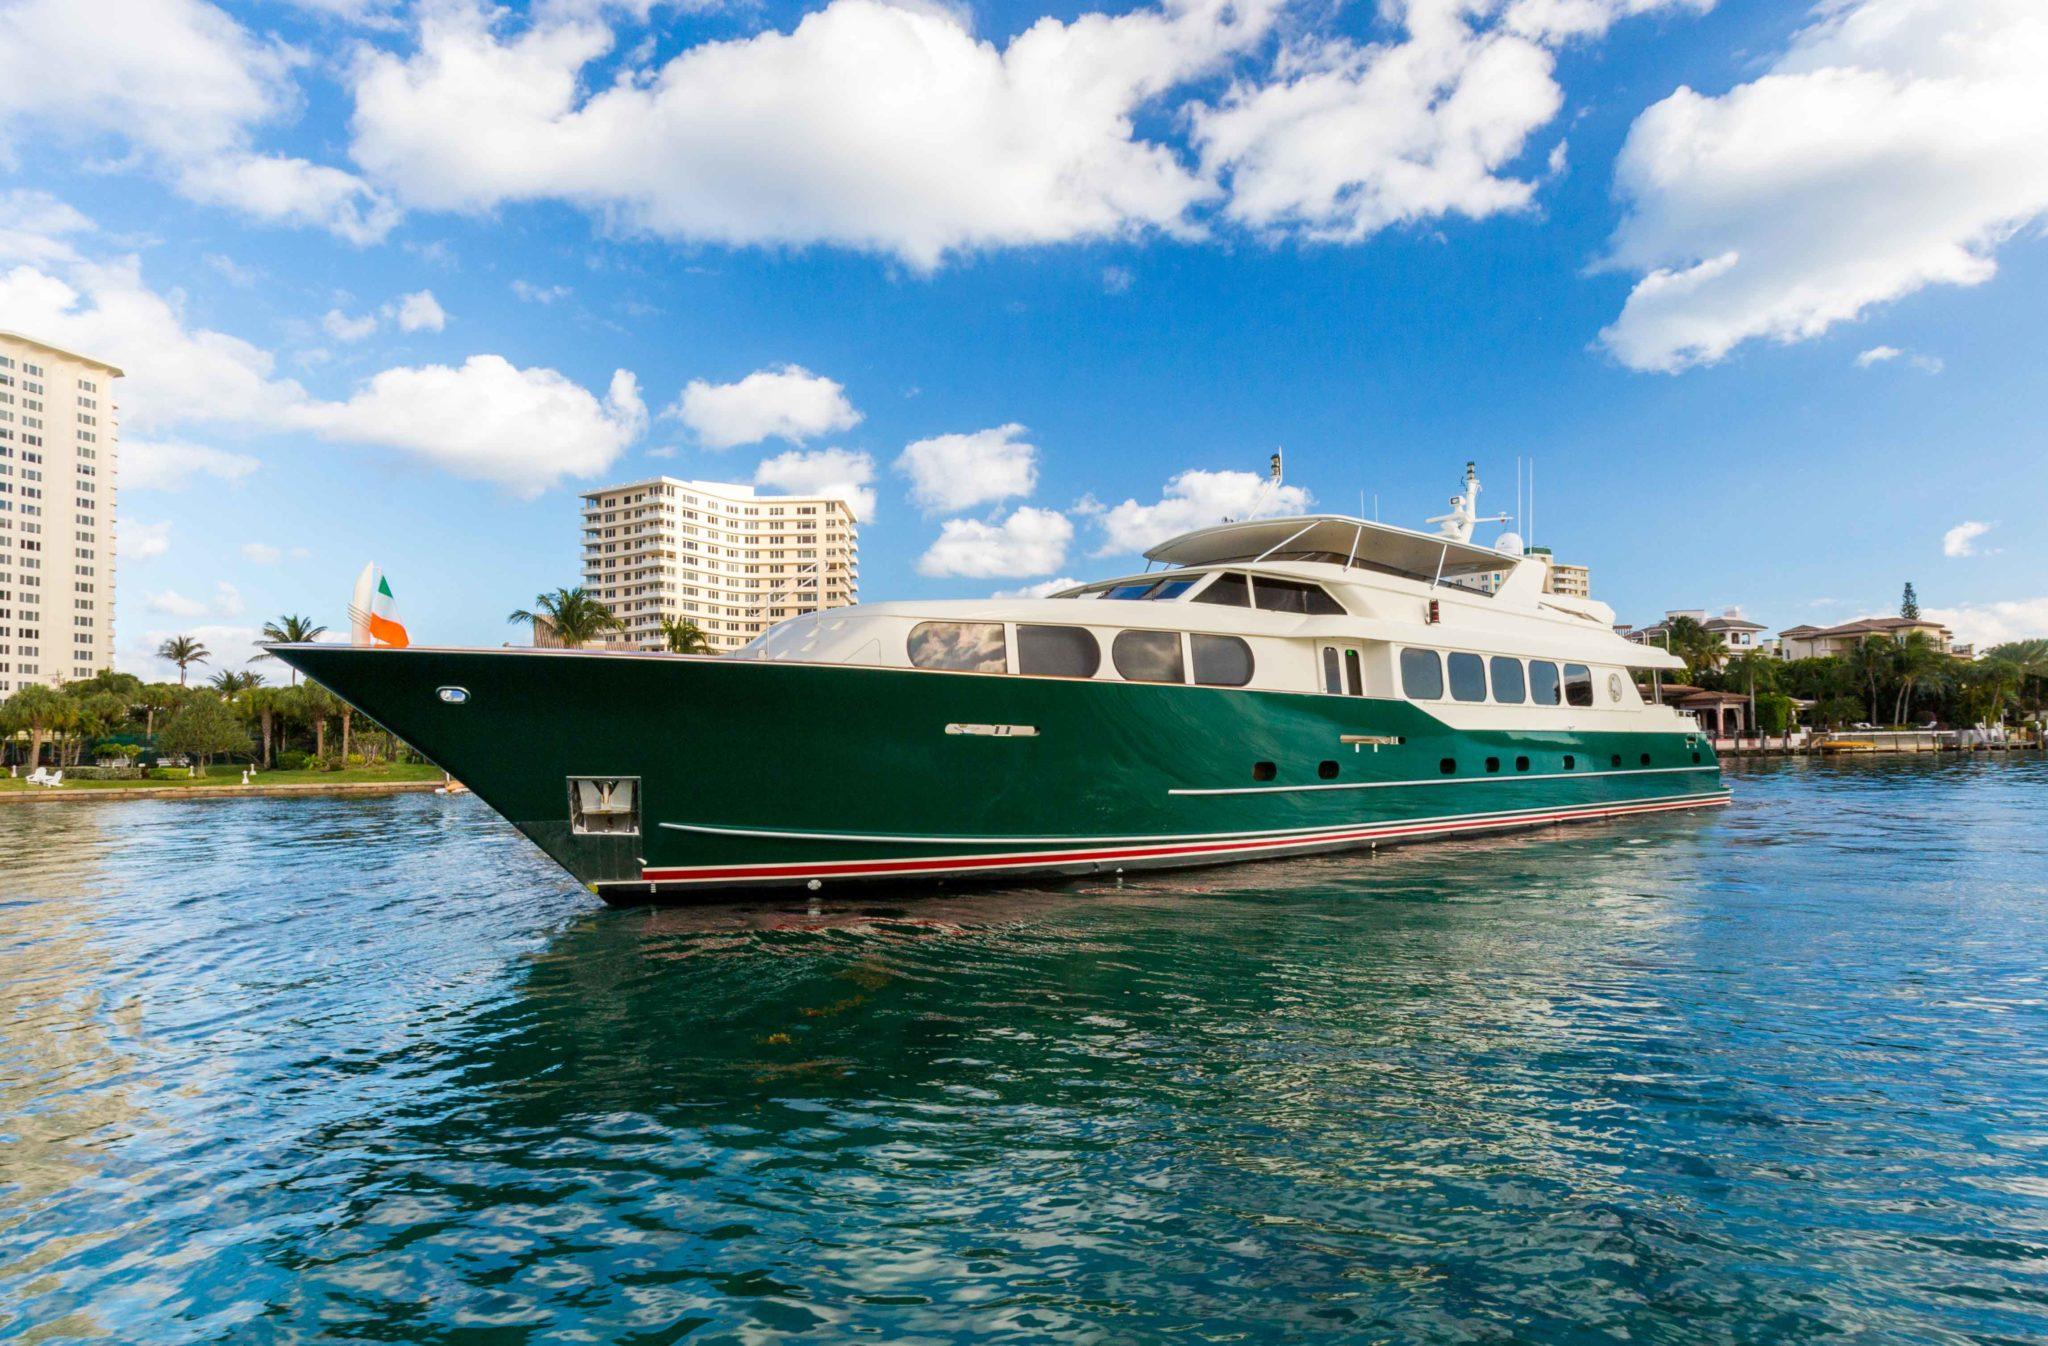 MY SONAS for sale through Worth Avenue Yachts +1 561 833 4462